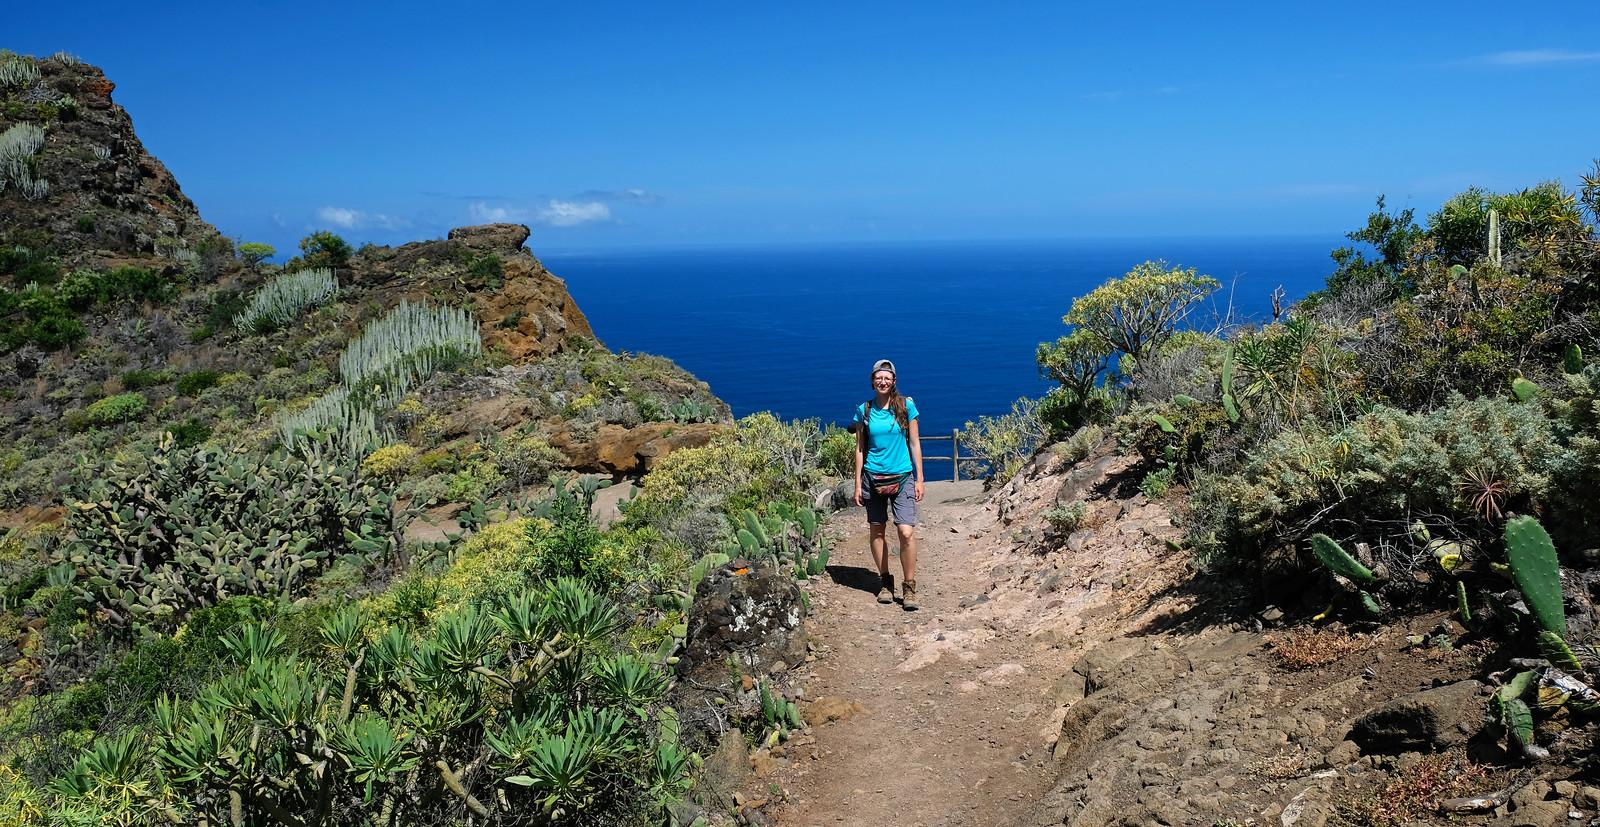 Anaga Rural Park, Tenerife, Canary Islands, Spain